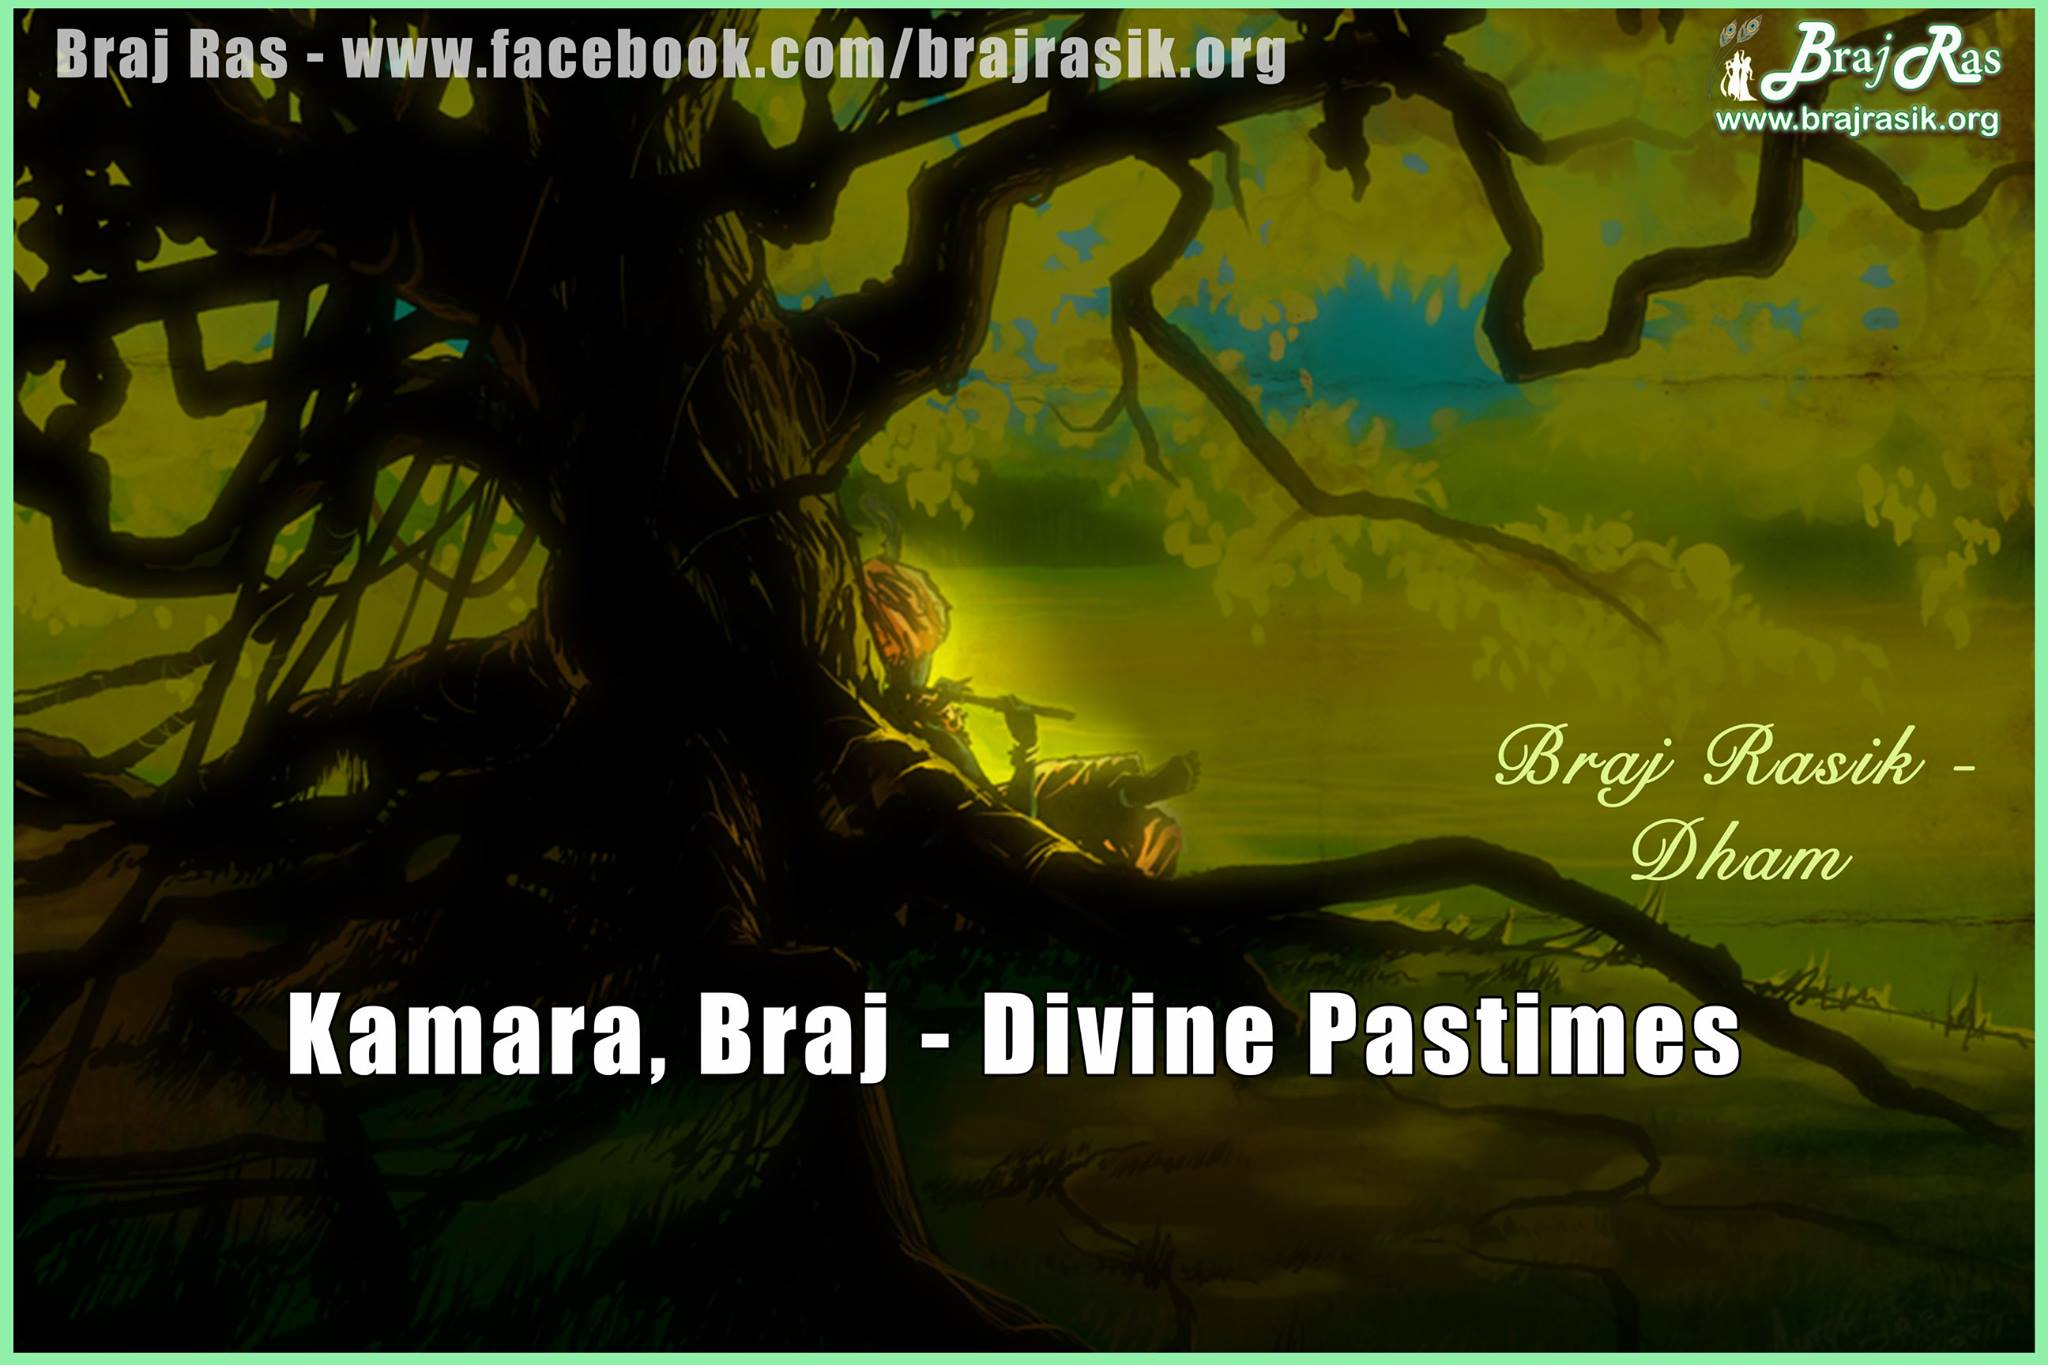 Kamara or Kaamar, Braj - Divine pastimes